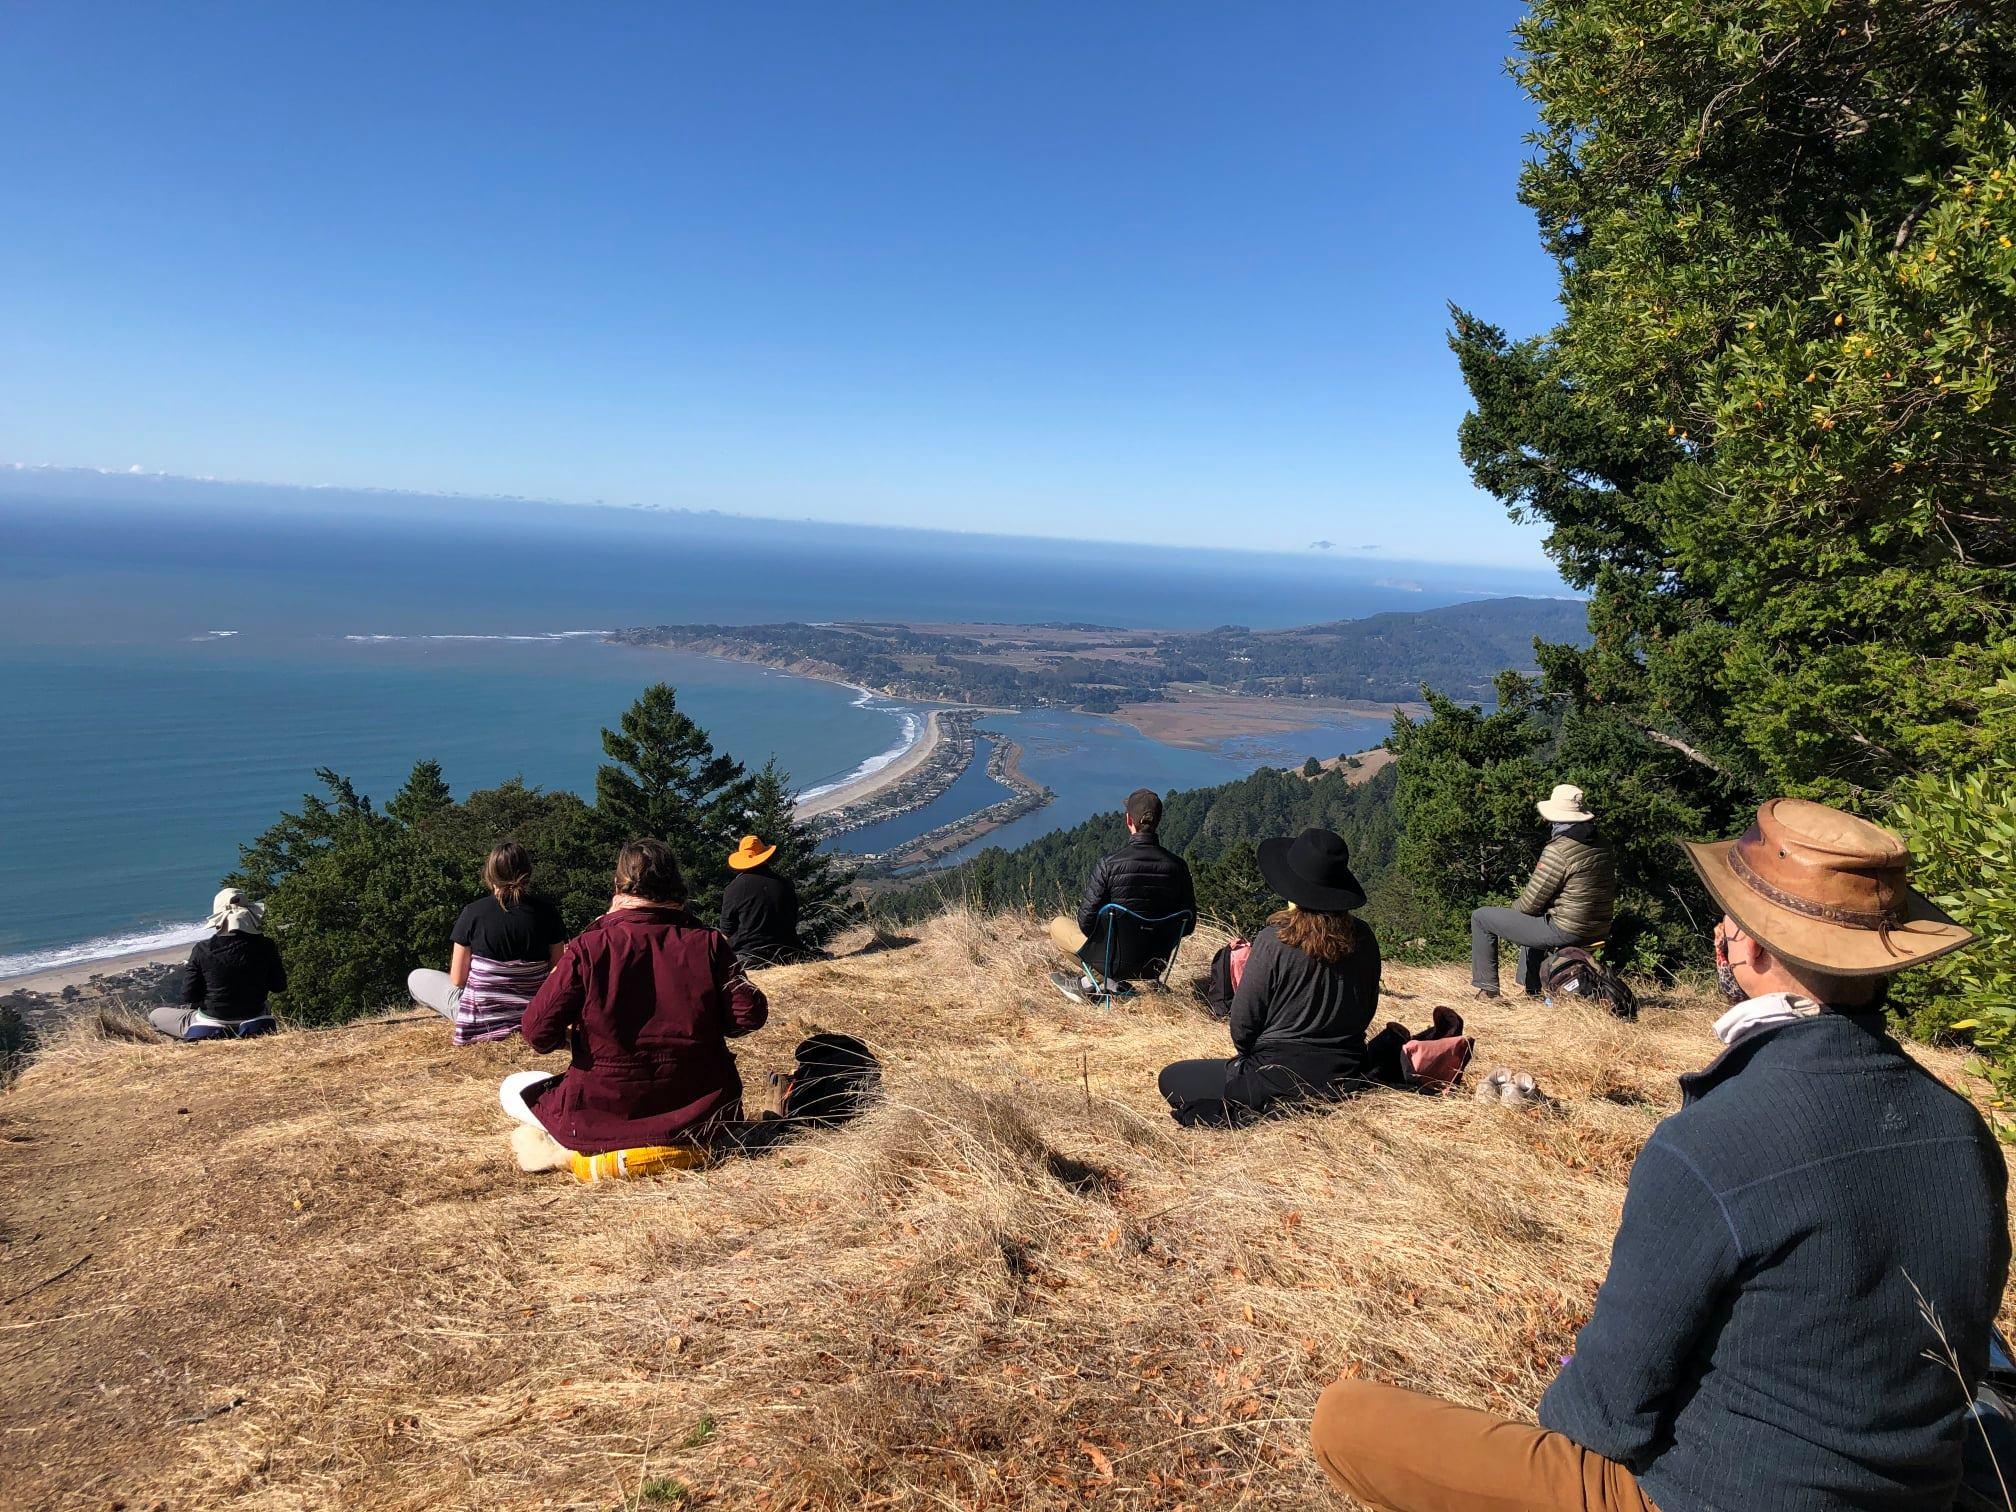 Meditating in the Marin Headlands